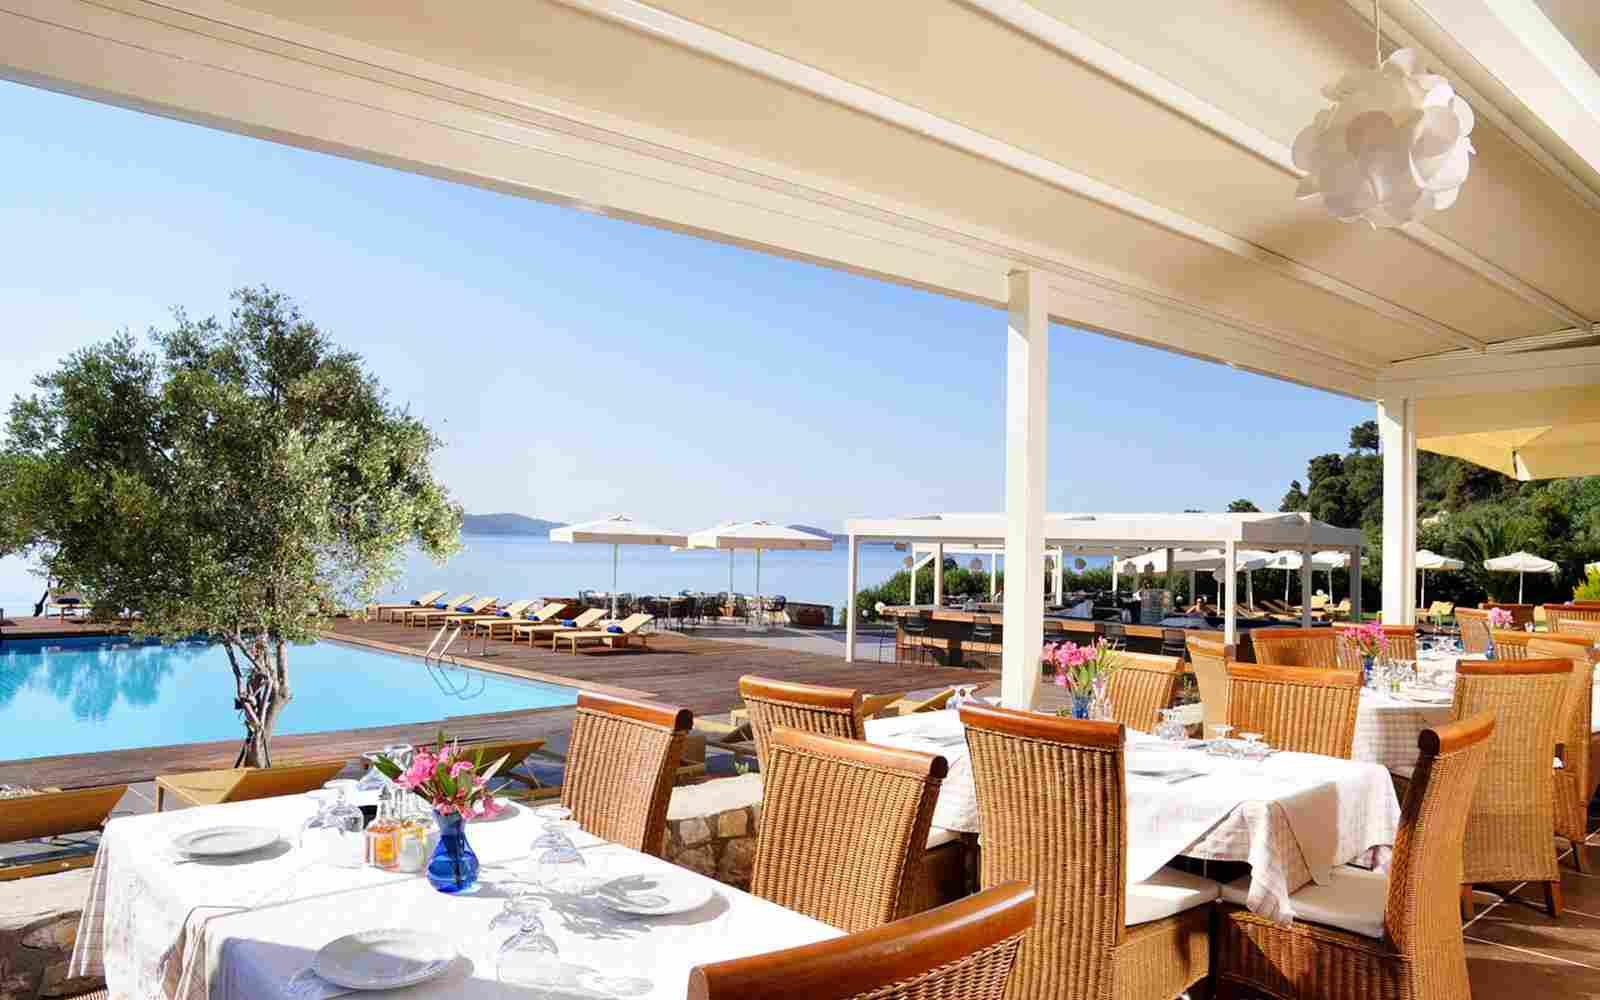 https://www.casacaribepuertomorelos.com/wp-content/uploads/2016/03/summer-hotel-08.jpg